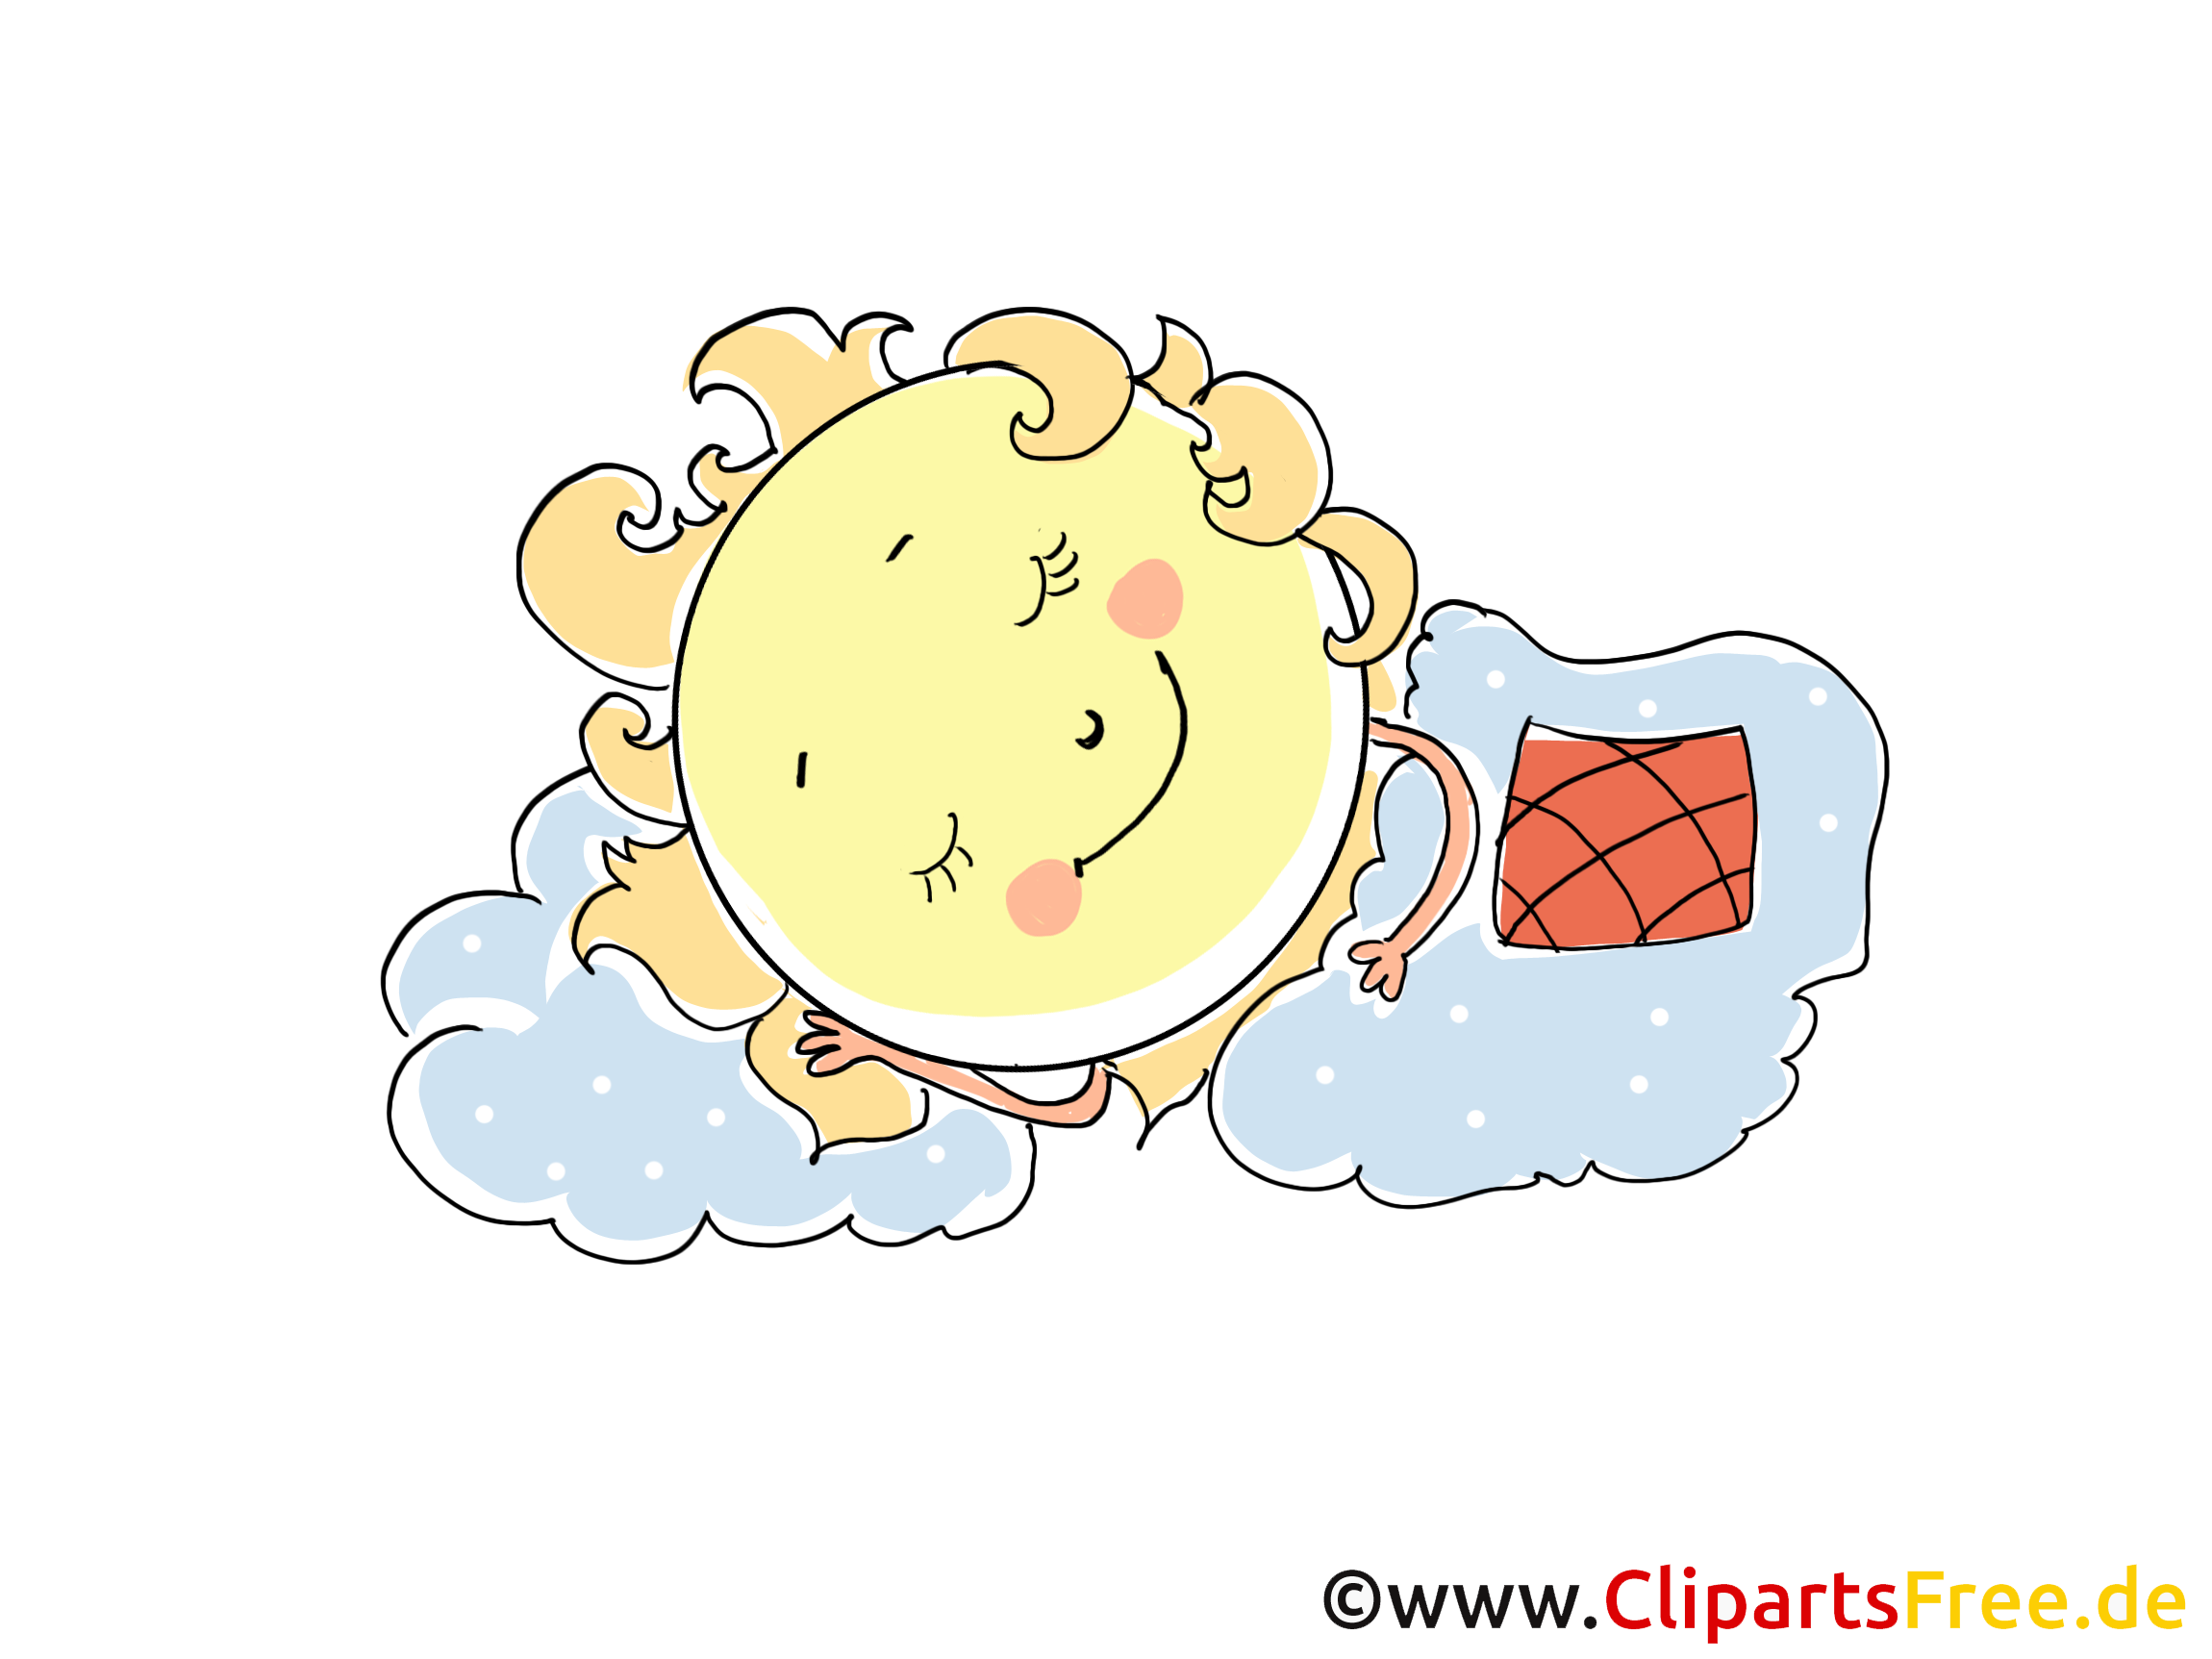 Clipart gute nacht banner royalty free download Wetter Bilder, Cliparts, Cartoons, Grafiken, Illustrationen, Gifs ... banner royalty free download